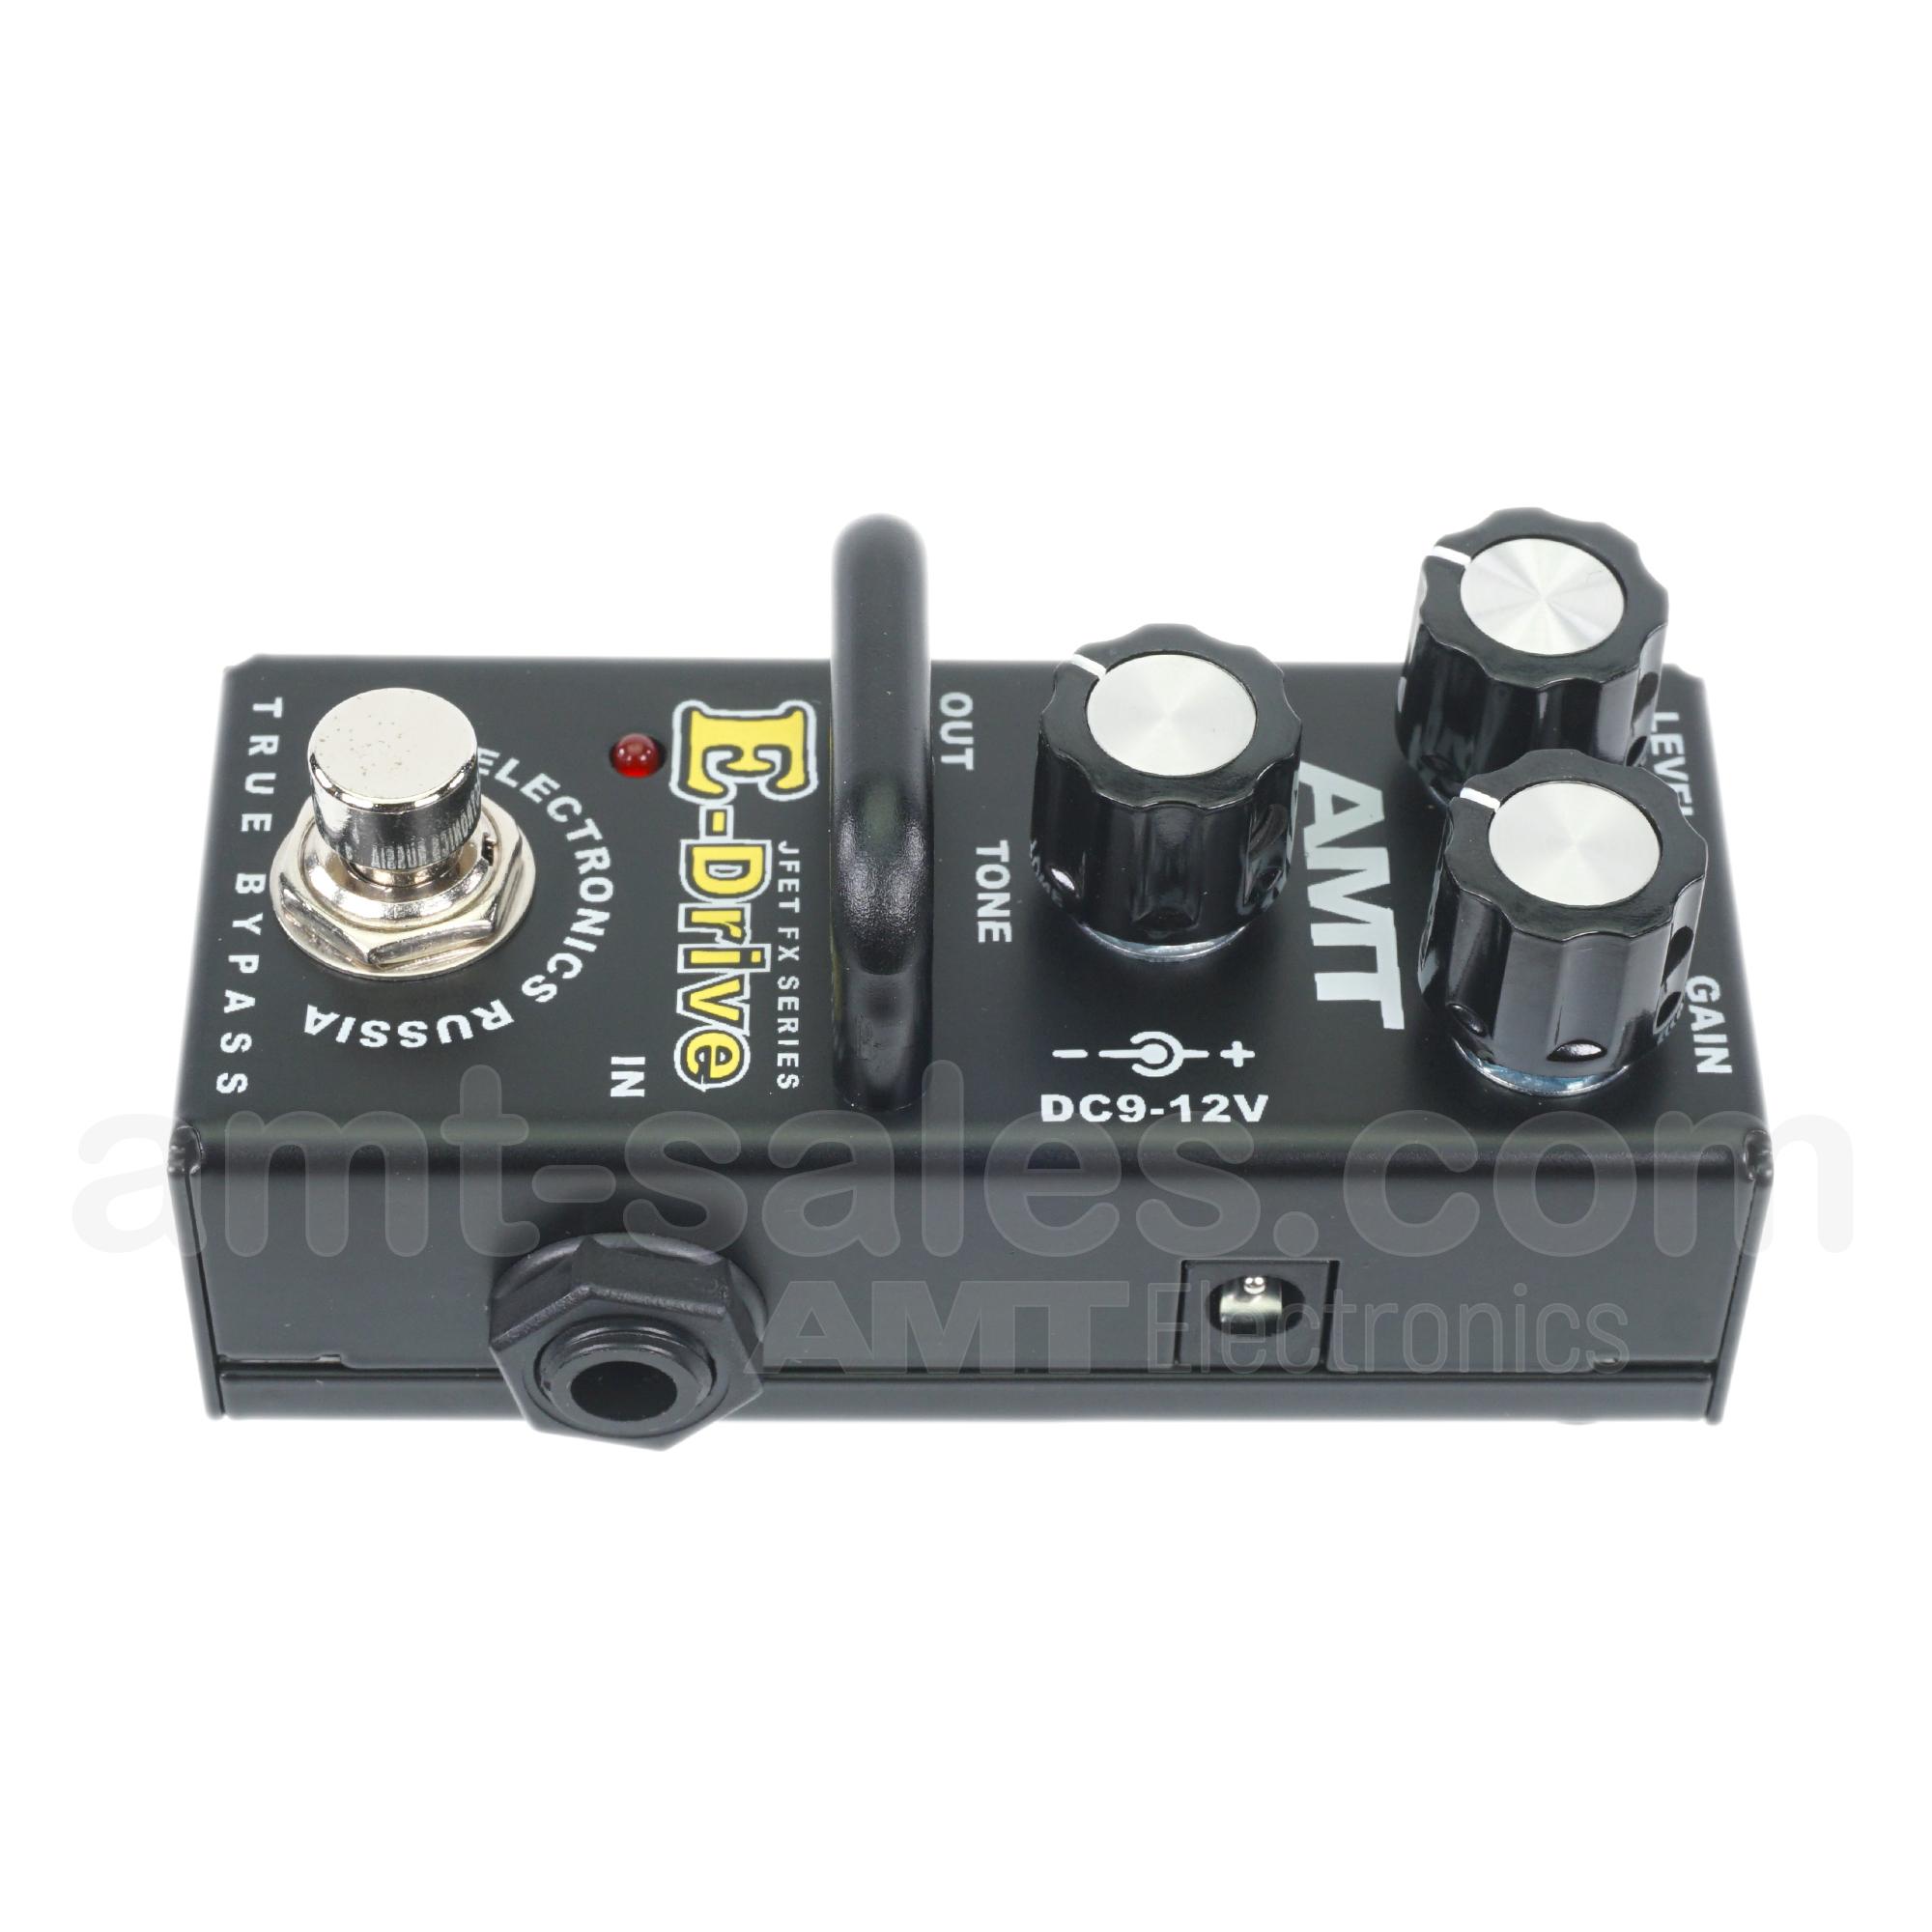 AMT E-Drive mini - JFET distortion pedal